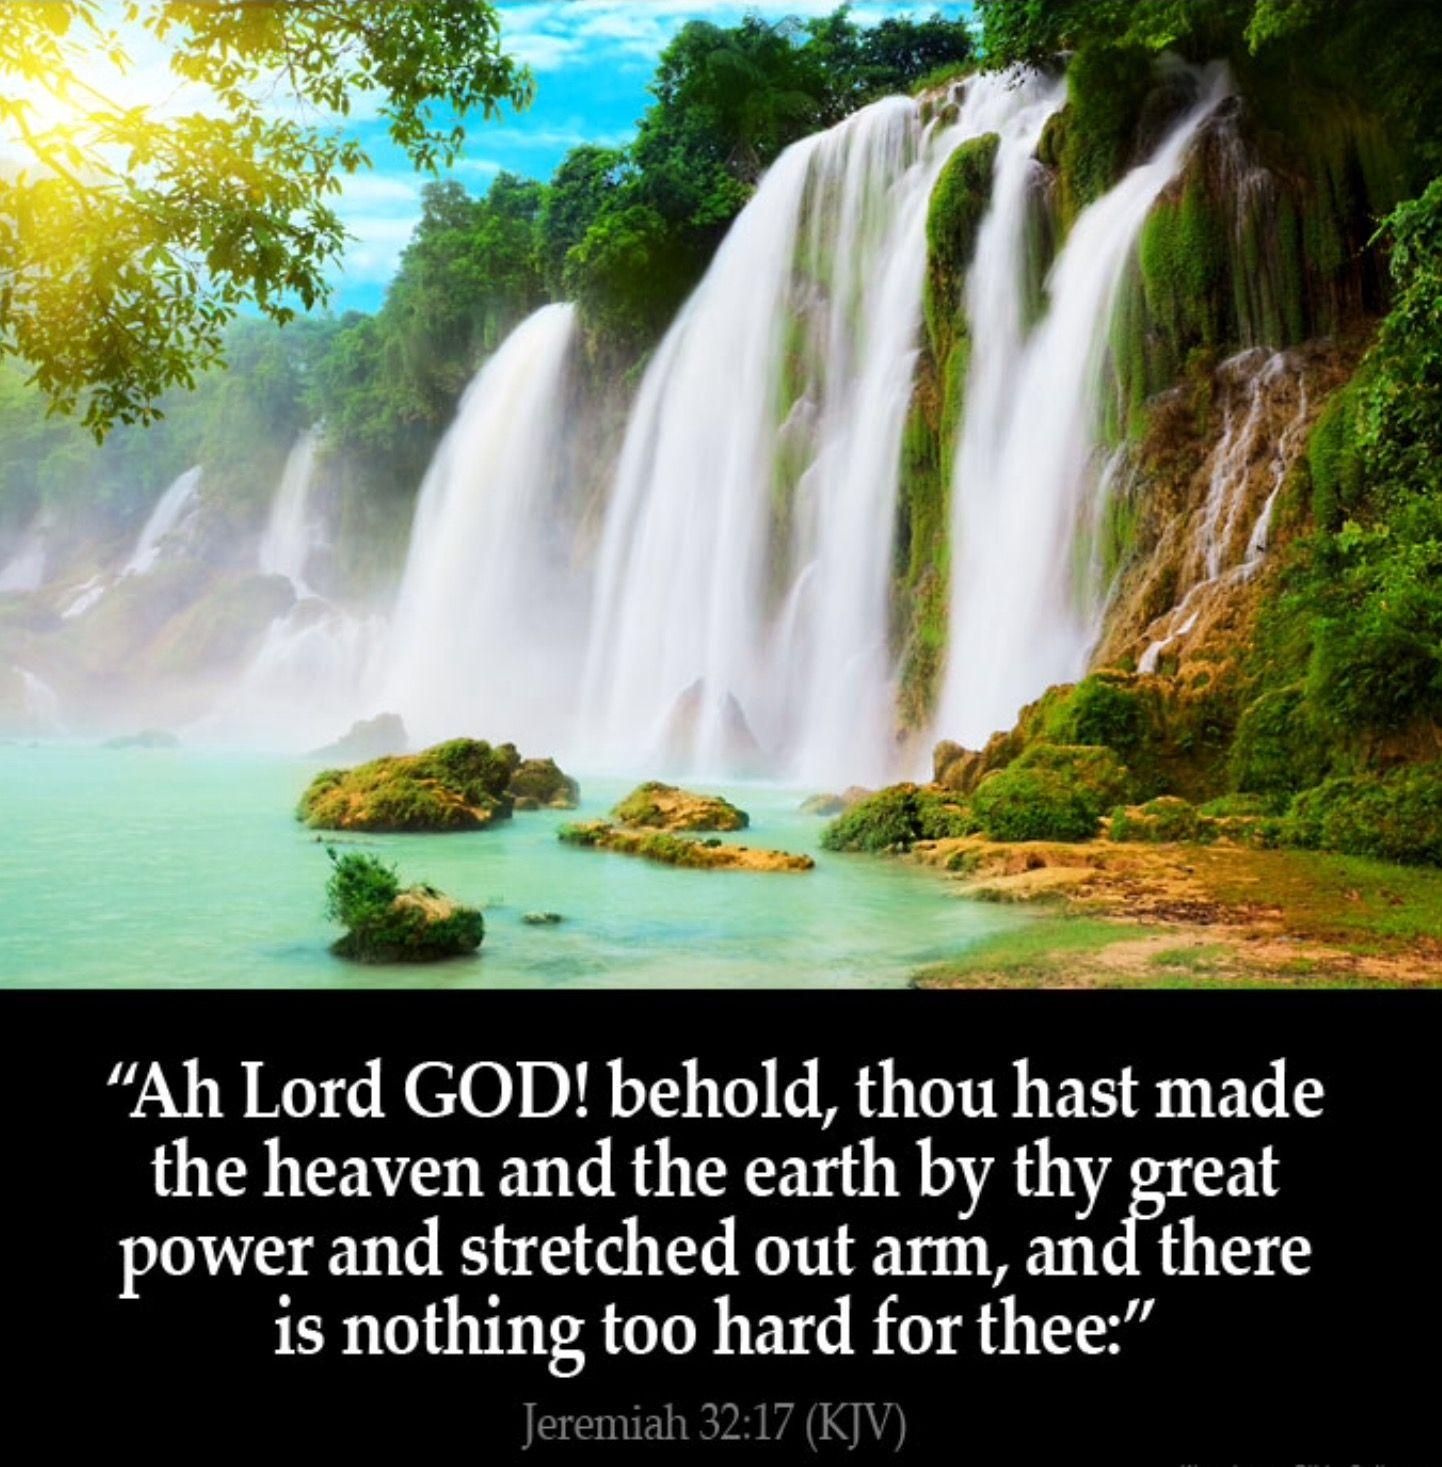 jeremiah 32 17 almighty god u0027s creation pinterest jeremiah 32